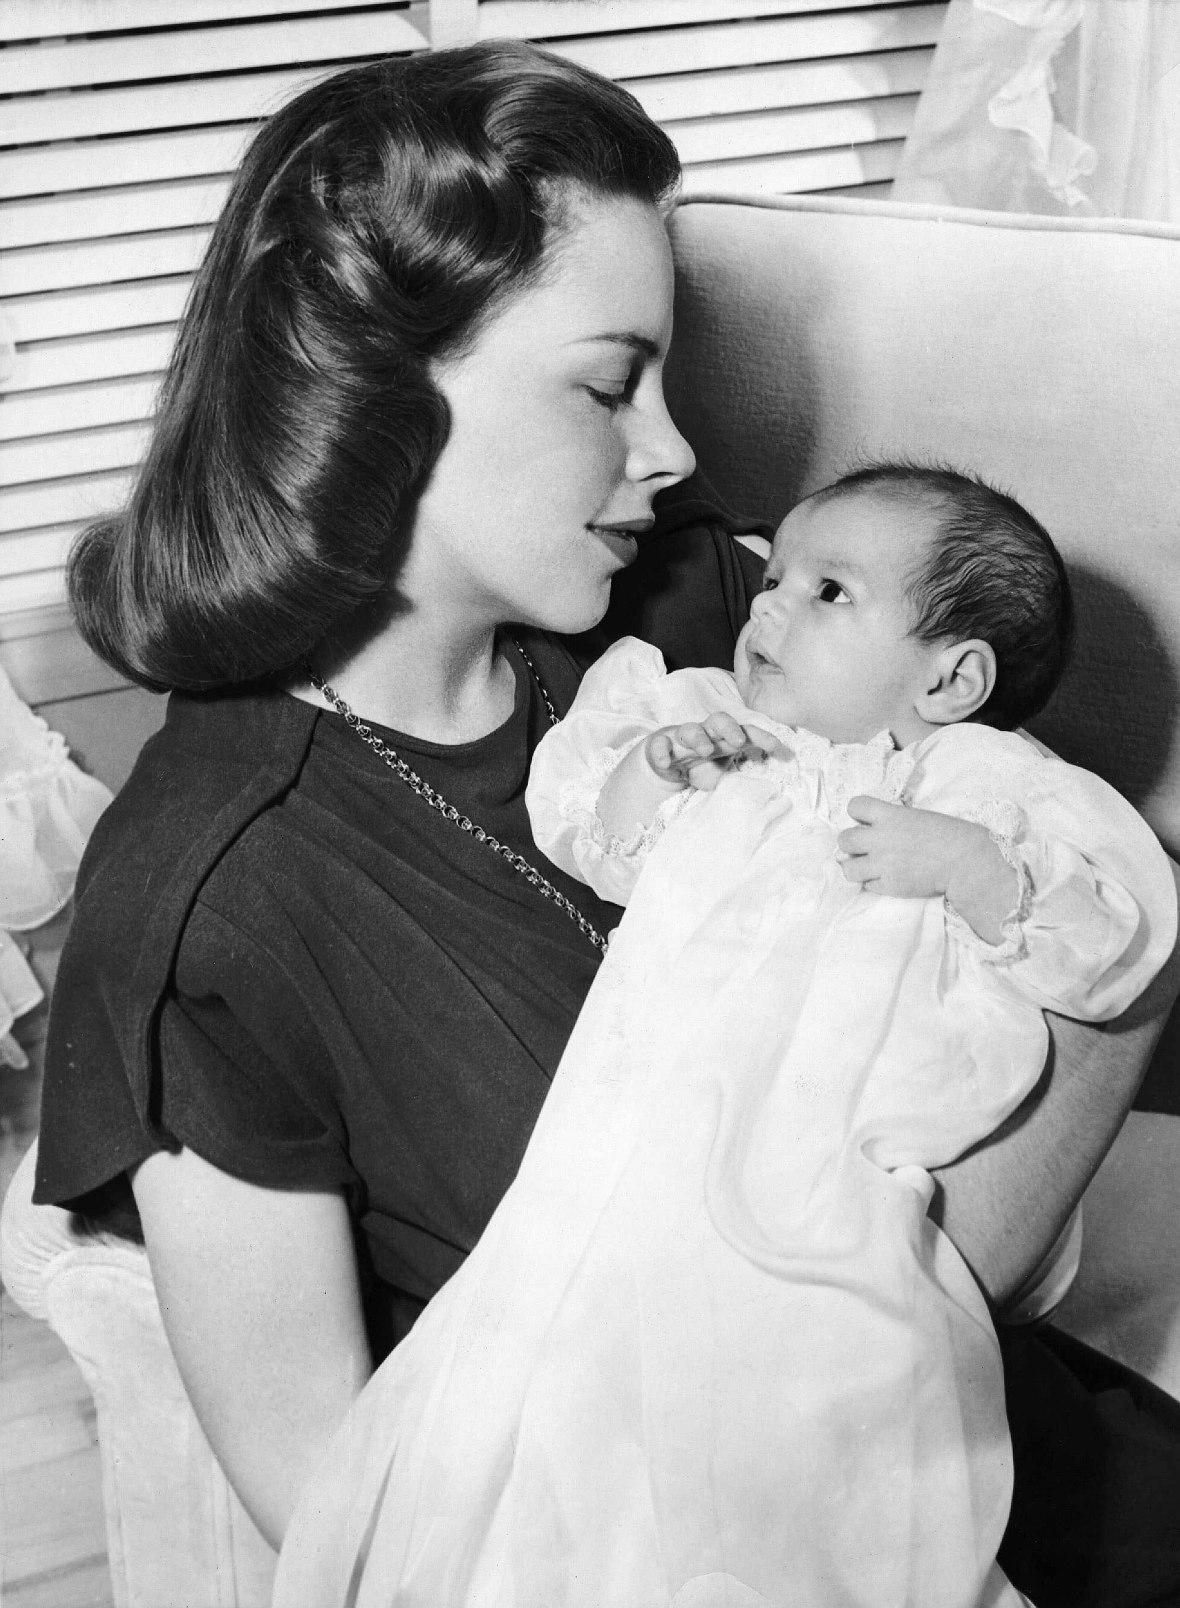 Judy Garland Holding Baby Daughter Liza Minnelli